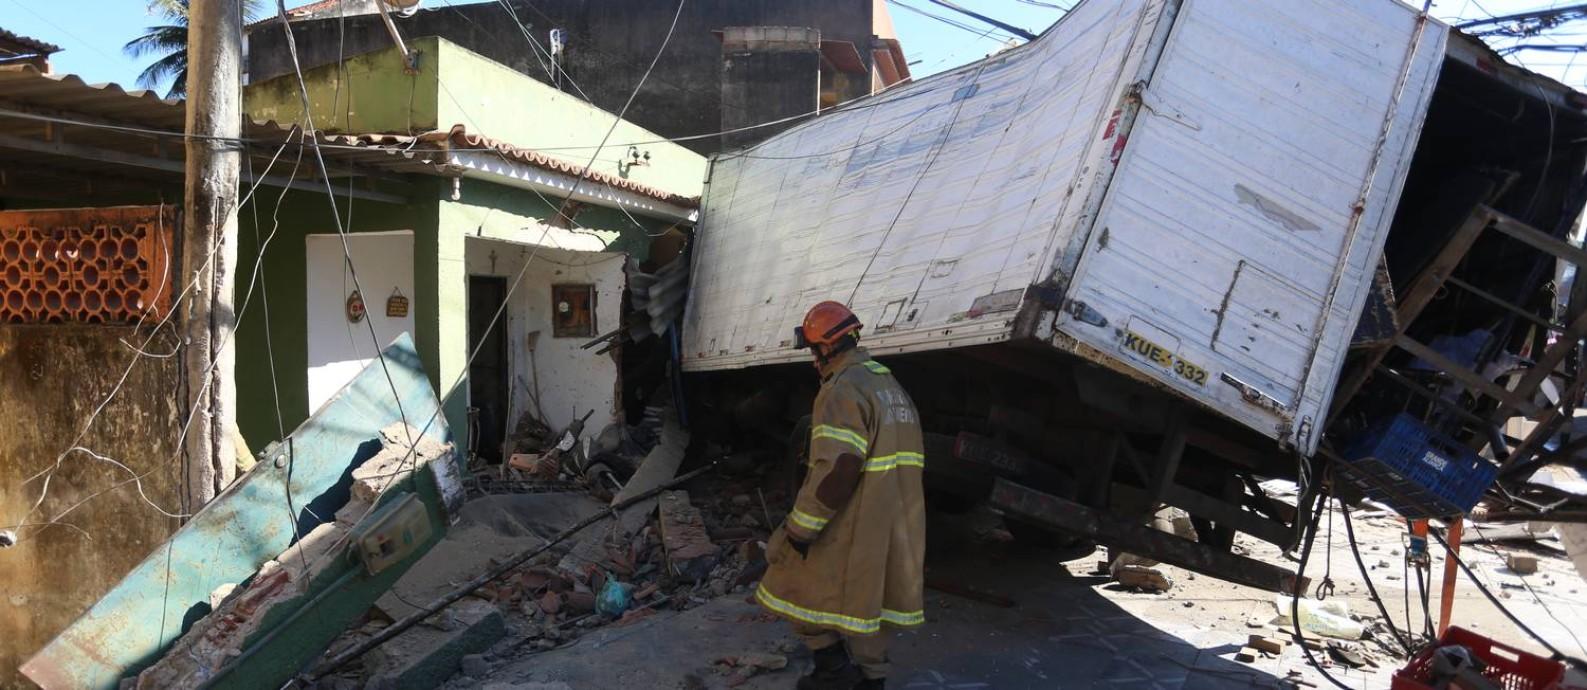 Segundo o Corpo de Bombeiros, o motorista morreu no local Foto: Fabiano Rocha / Fabiano Rocha